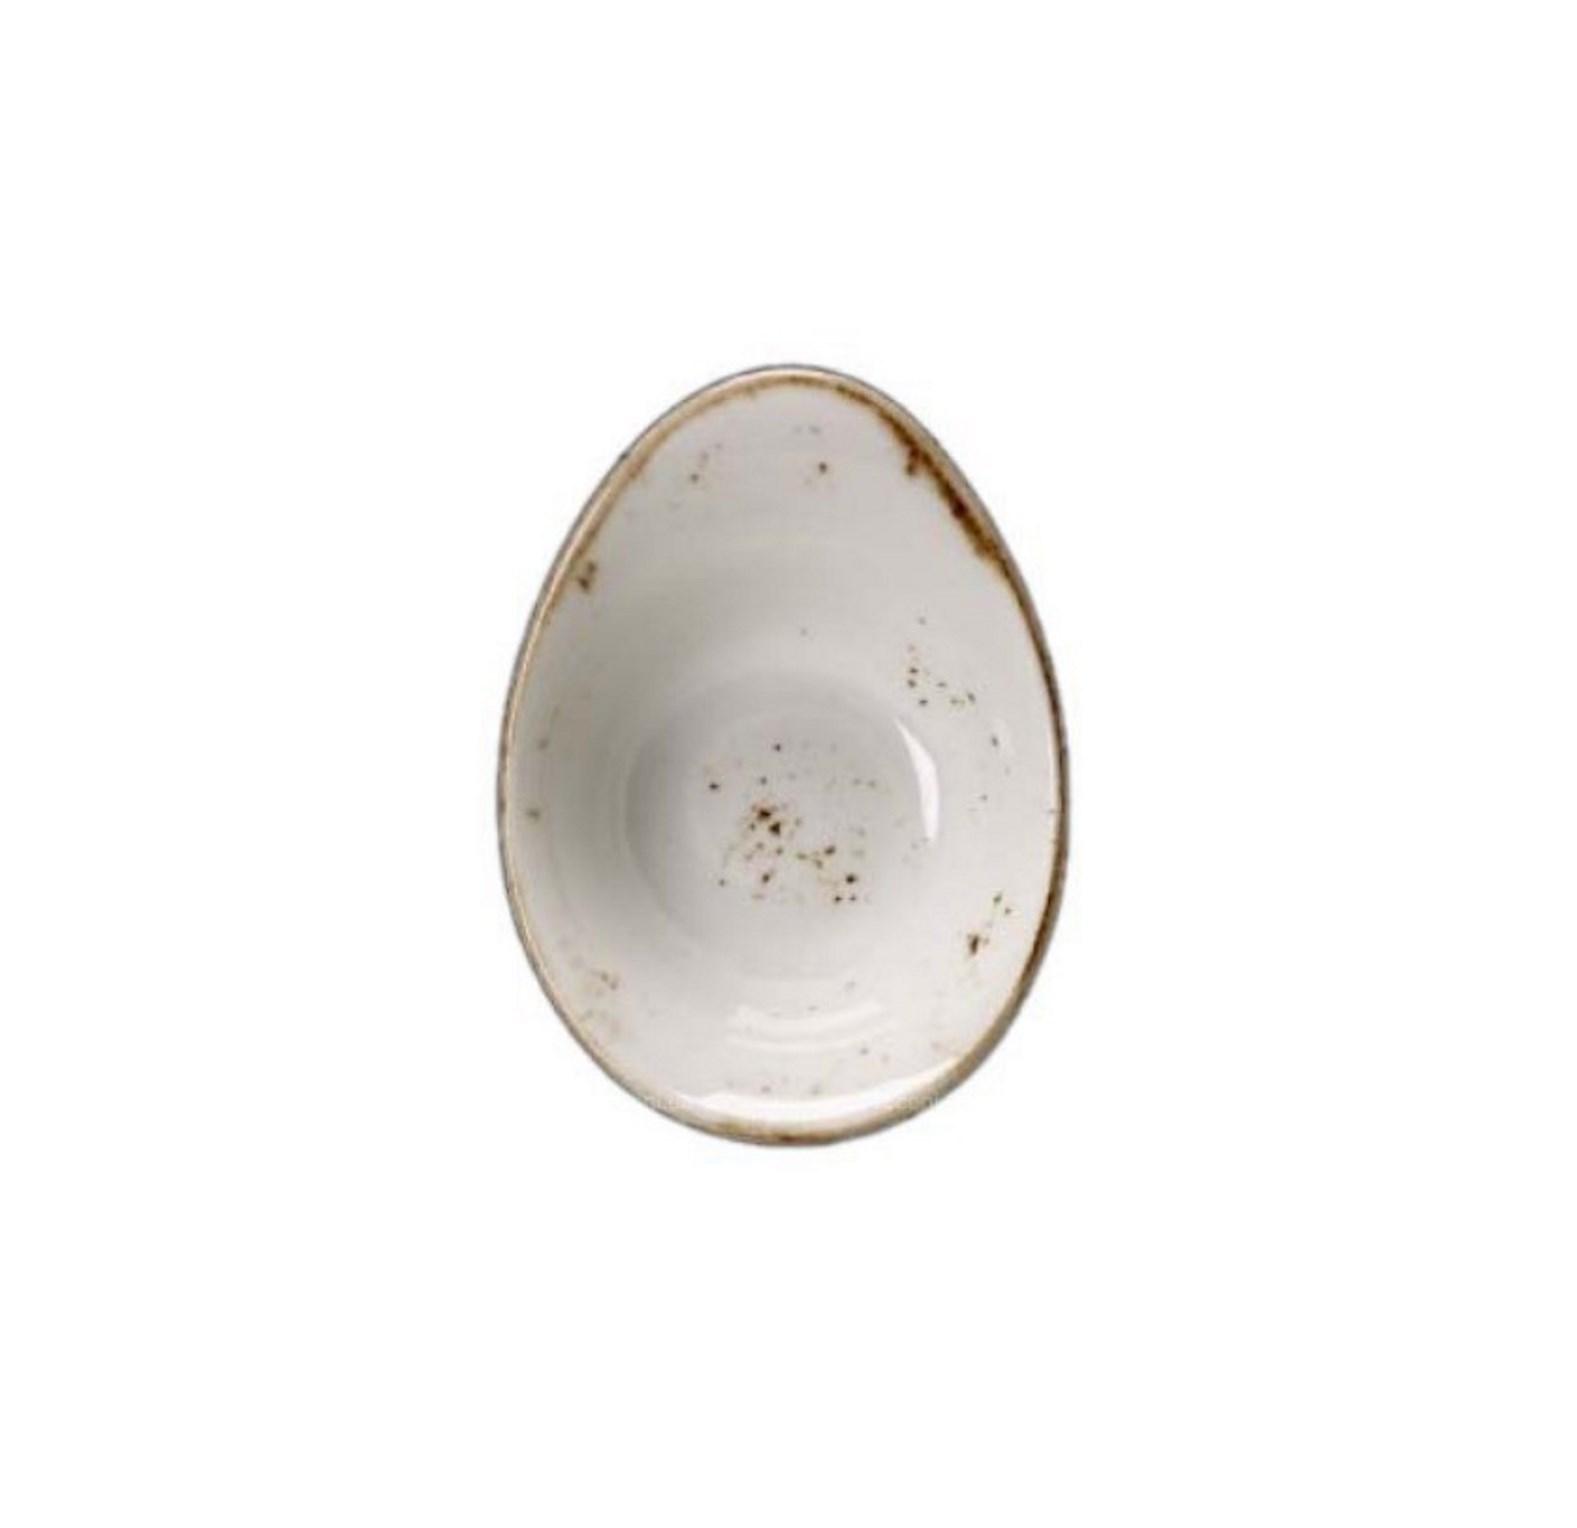 Онлайн каталог PROMENU: Пиала фарфоровая ассиметричная Steelite CRAFT WHITE, диаметр 13 см, белая